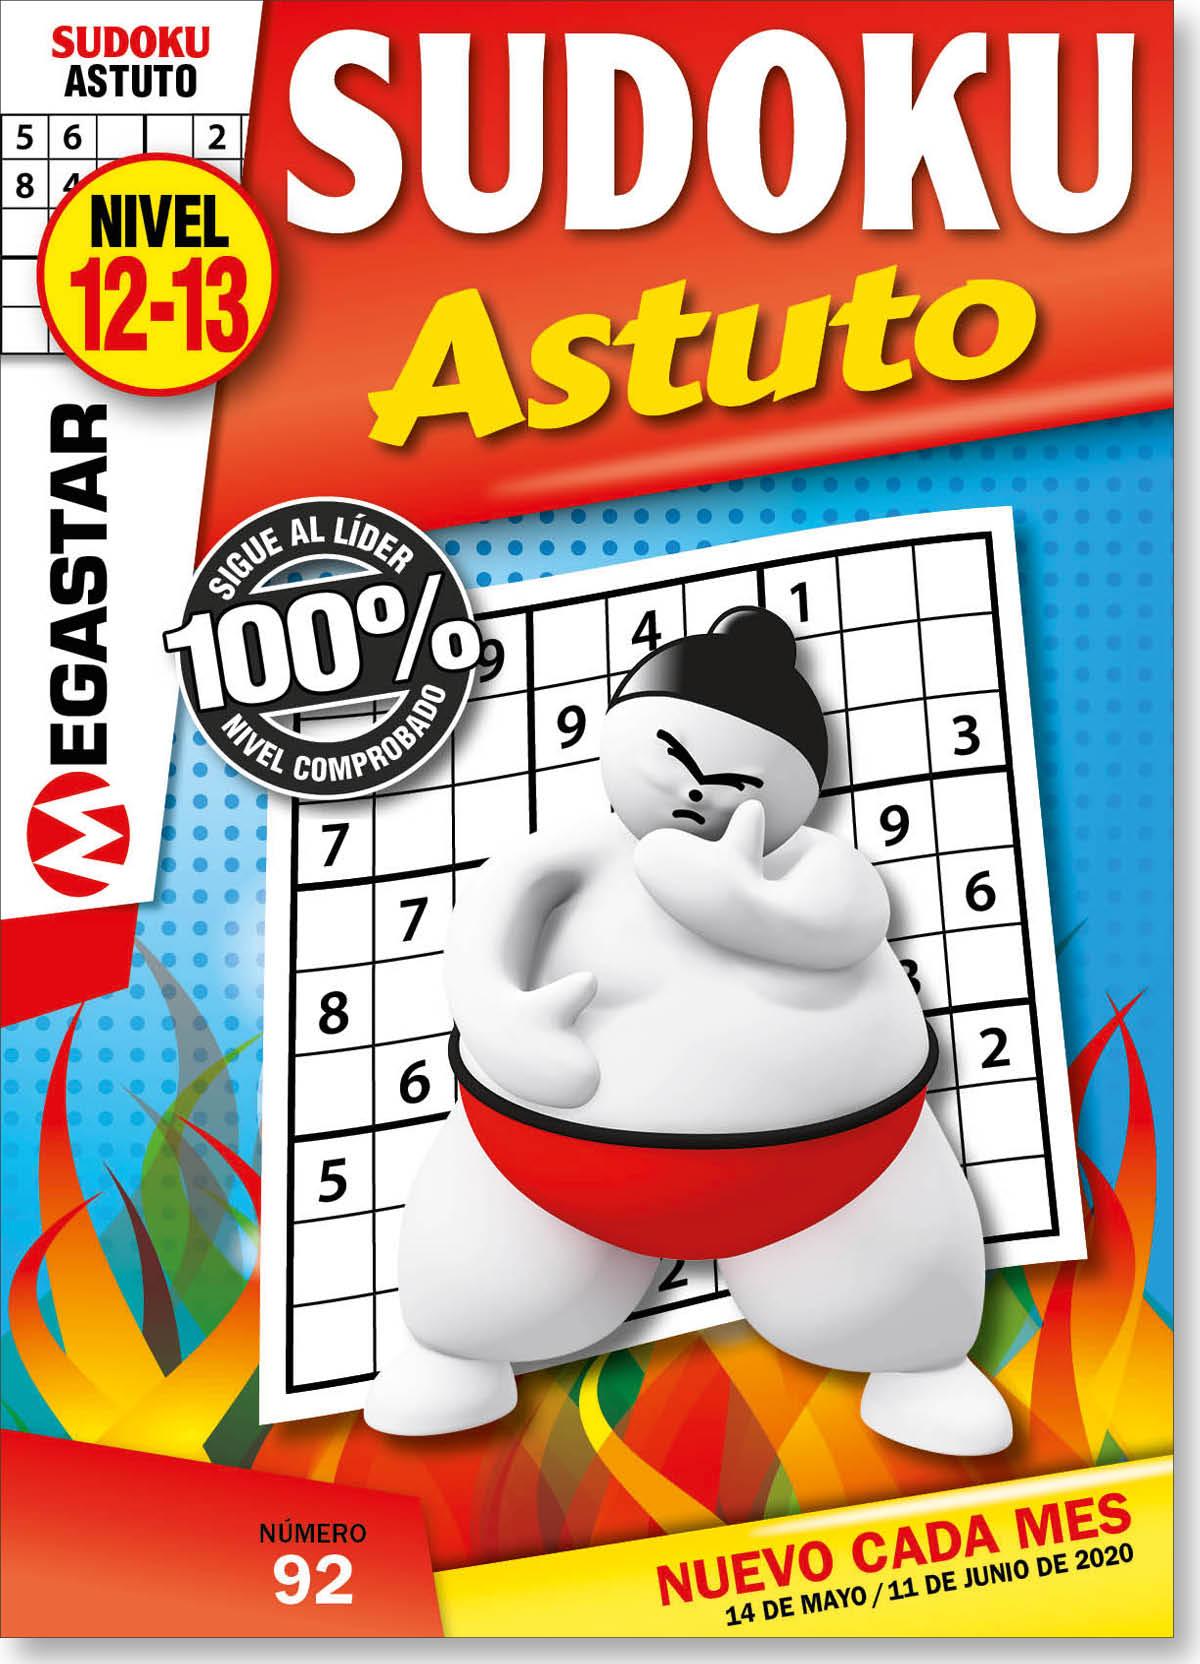 Sudoku Astuto Nivel 12-13